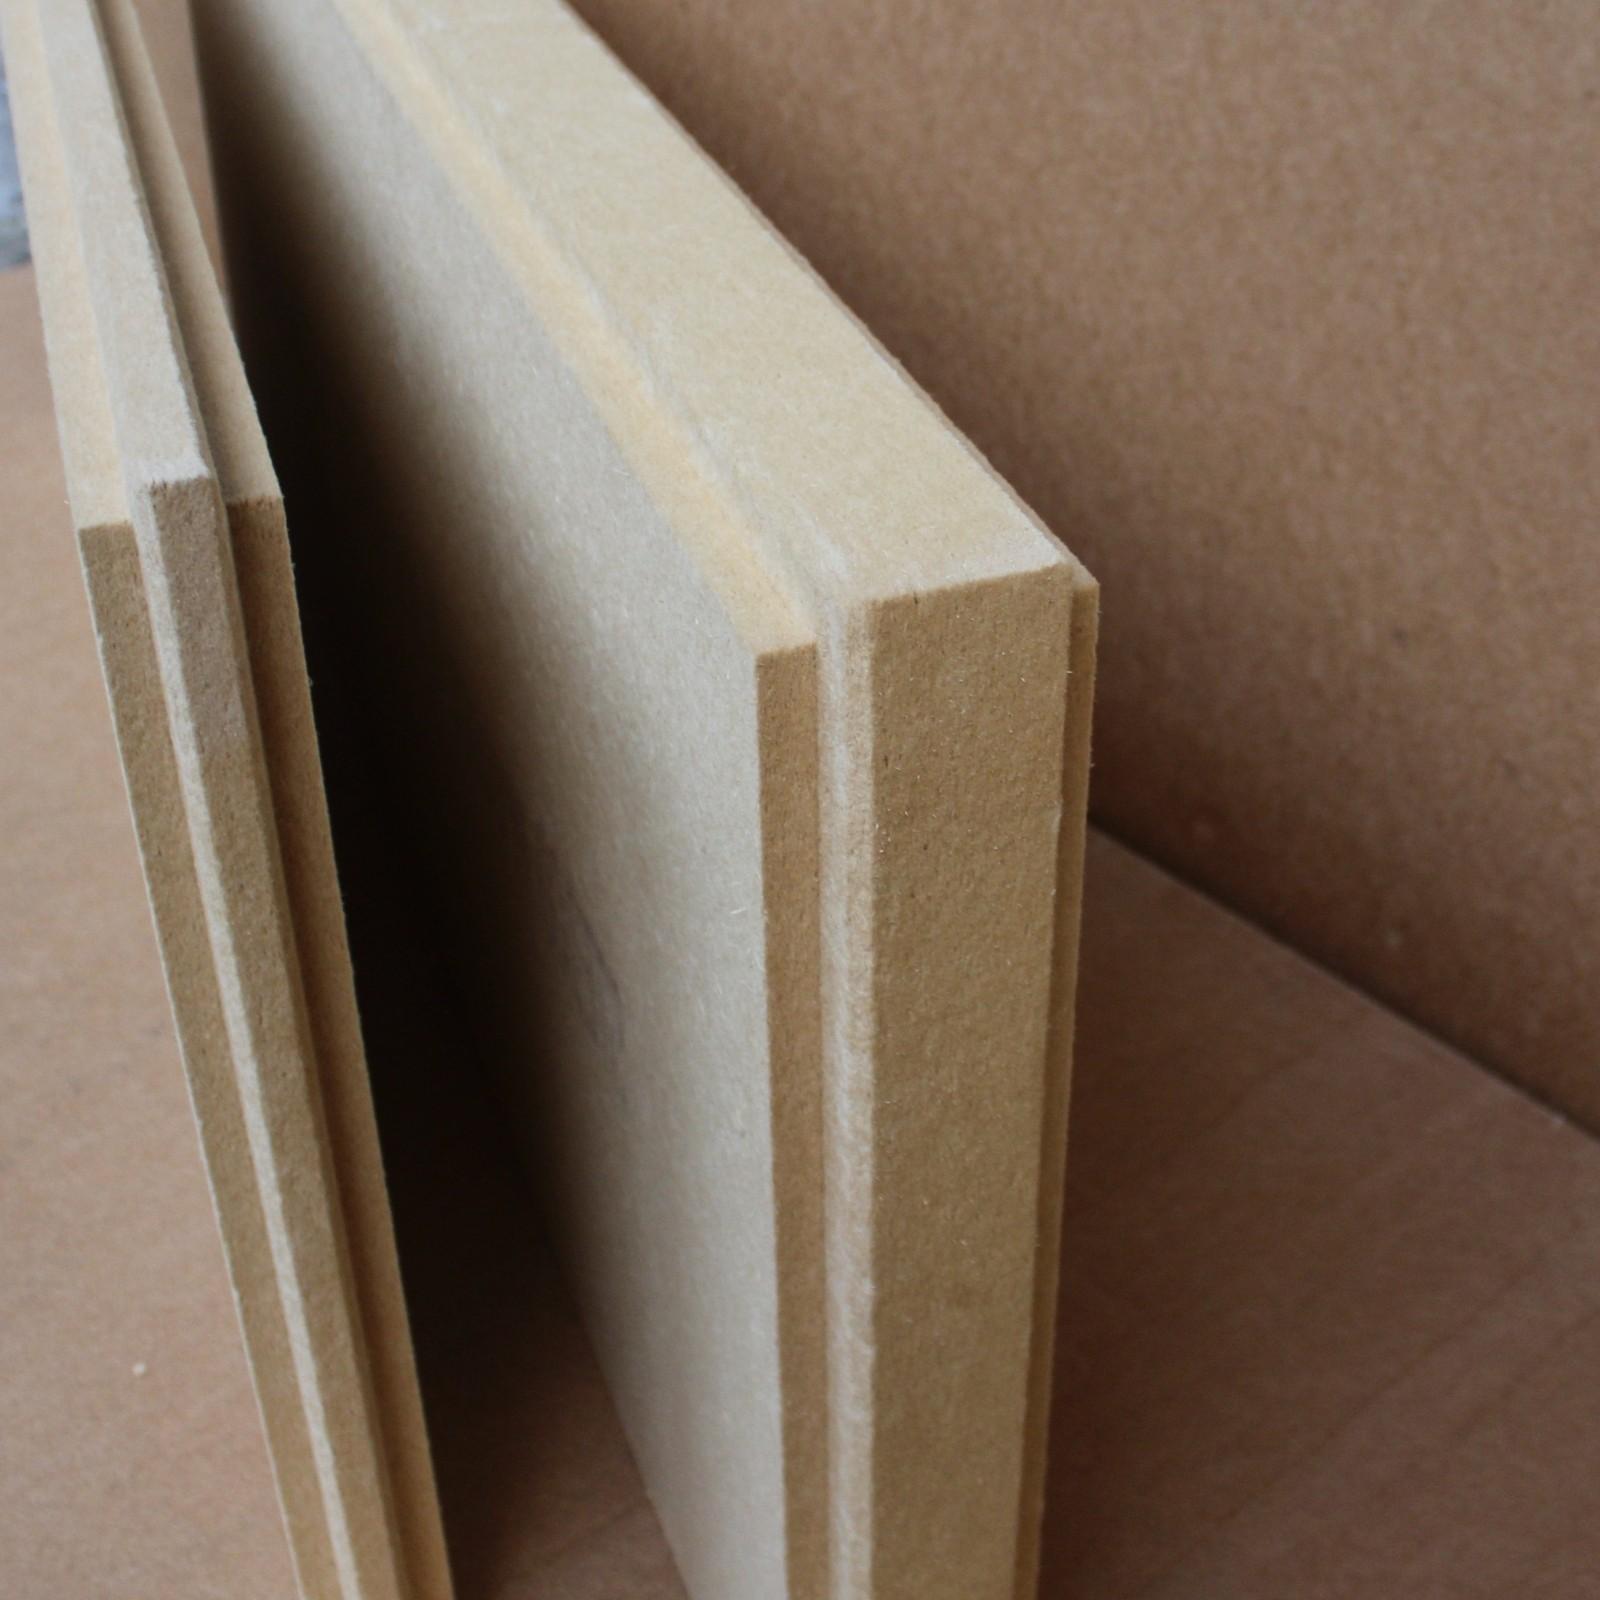 STEICO protect dry 40 mm 4-seitig Nut und Feder